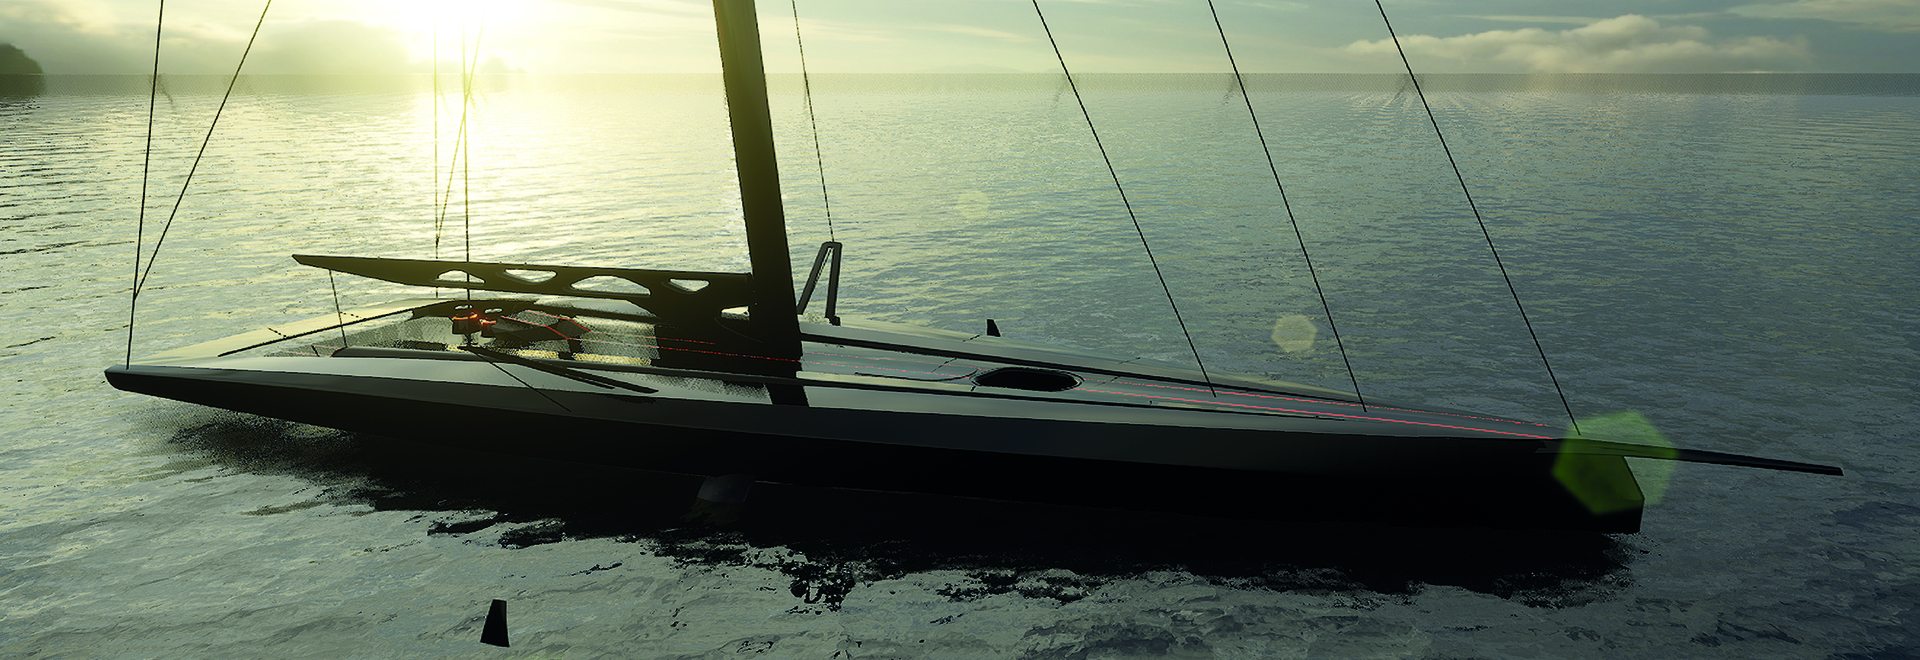 Persico Marine e Carkeek Design Partners presentano F 70 full-foiling day sailer-racer